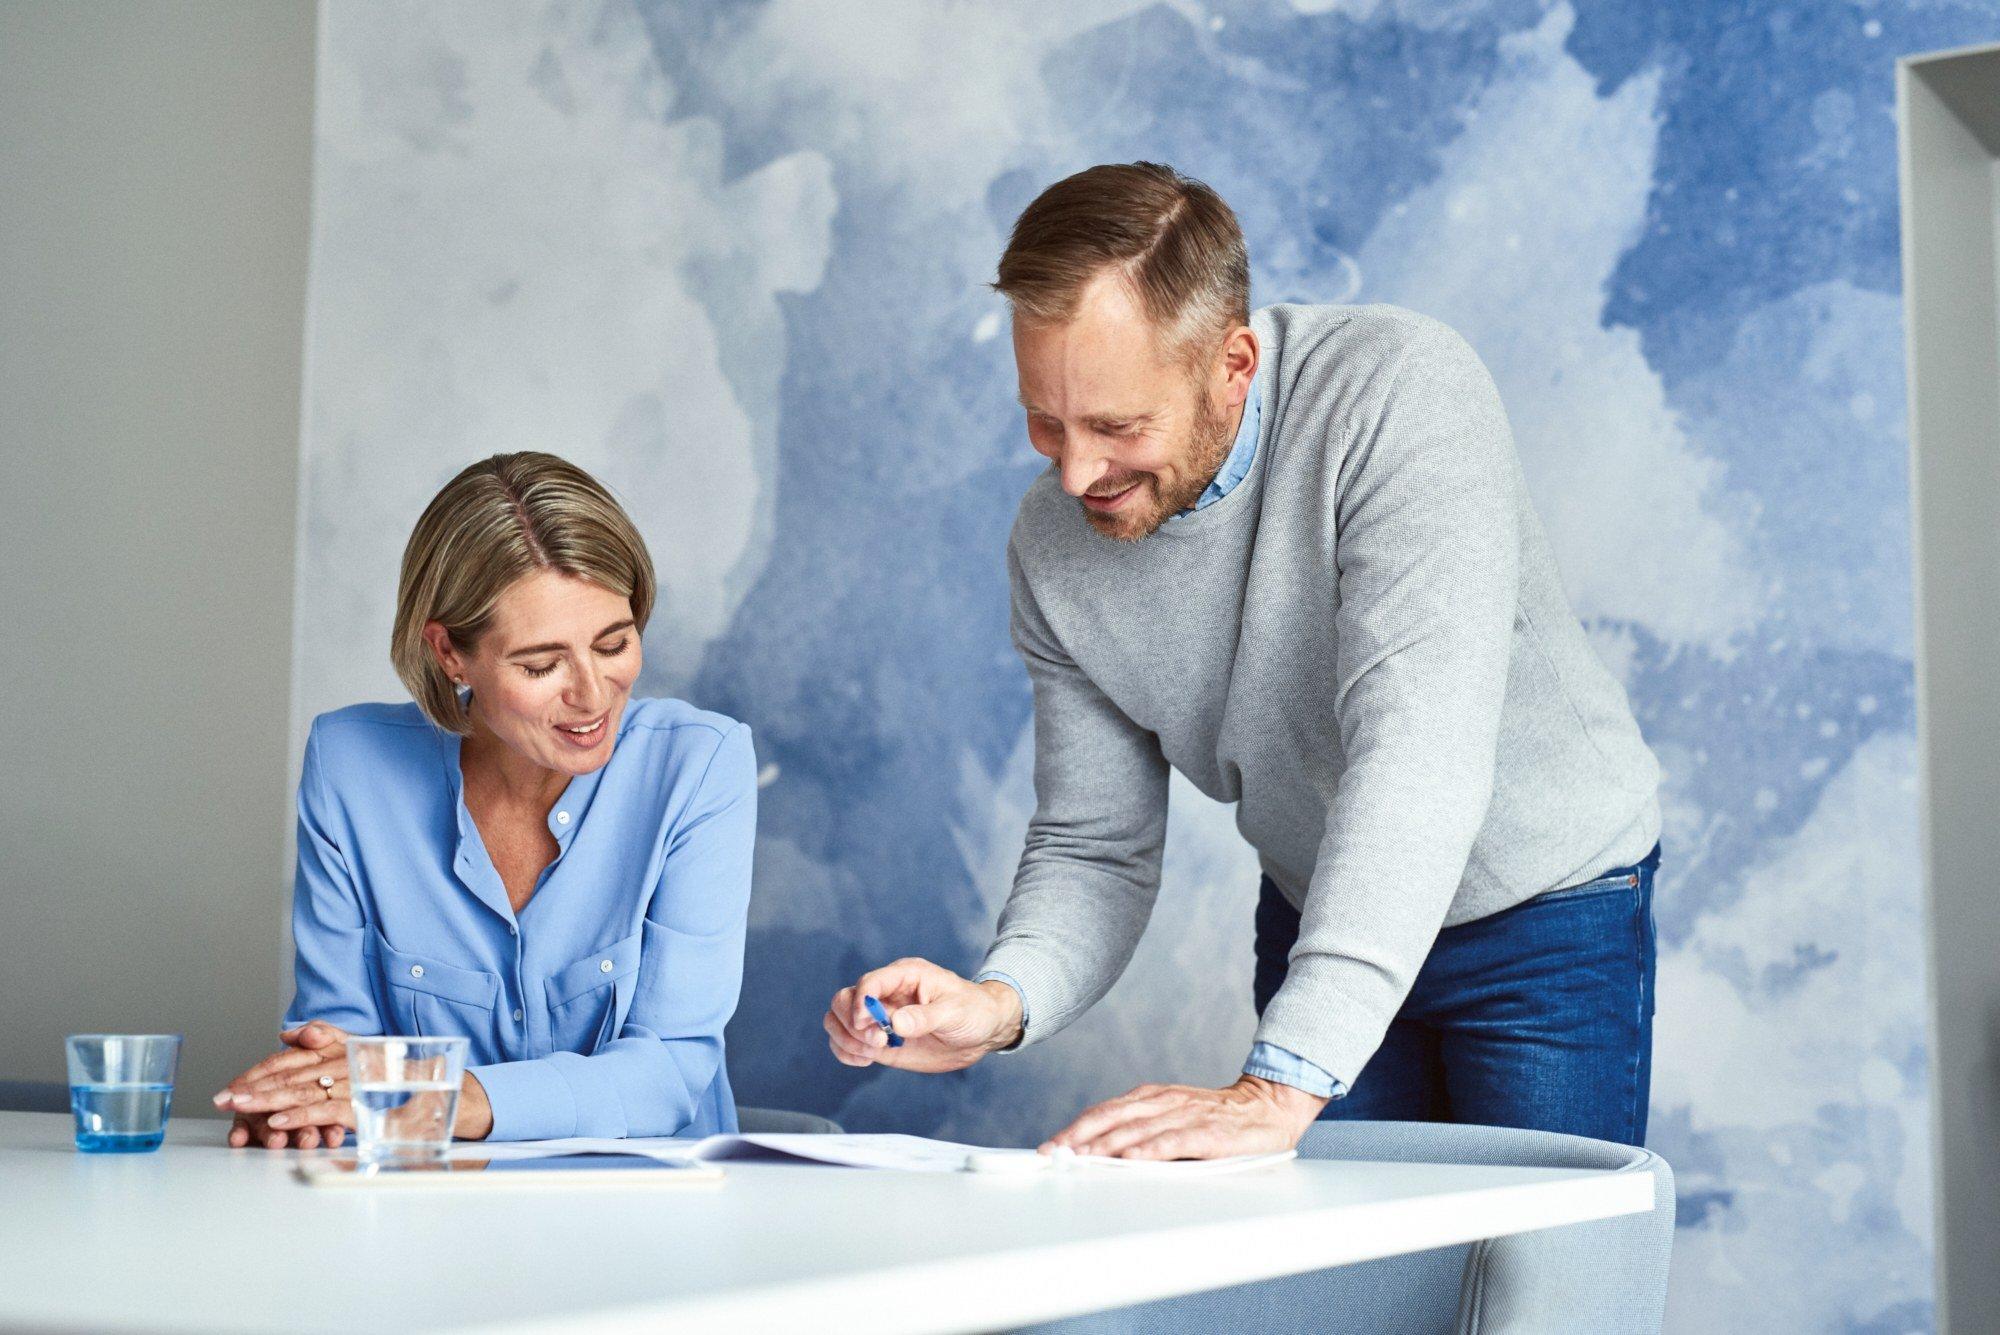 Firstbeat Guide: Smart Wellness Coaching - Understanding Your Clients' Stress-Recovery Balance